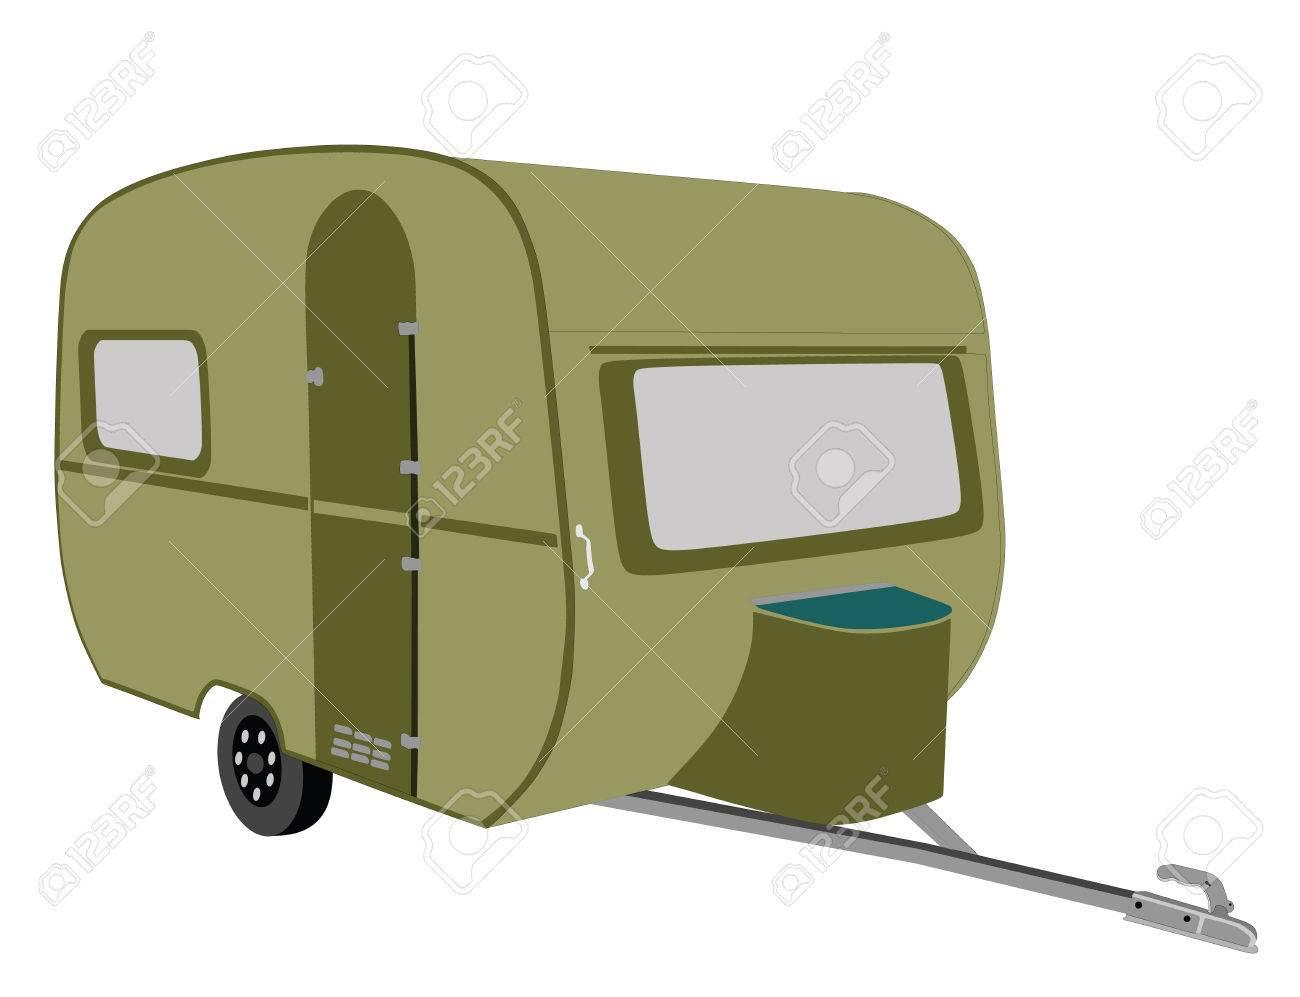 Camper Trailer Vector Illustration Stock